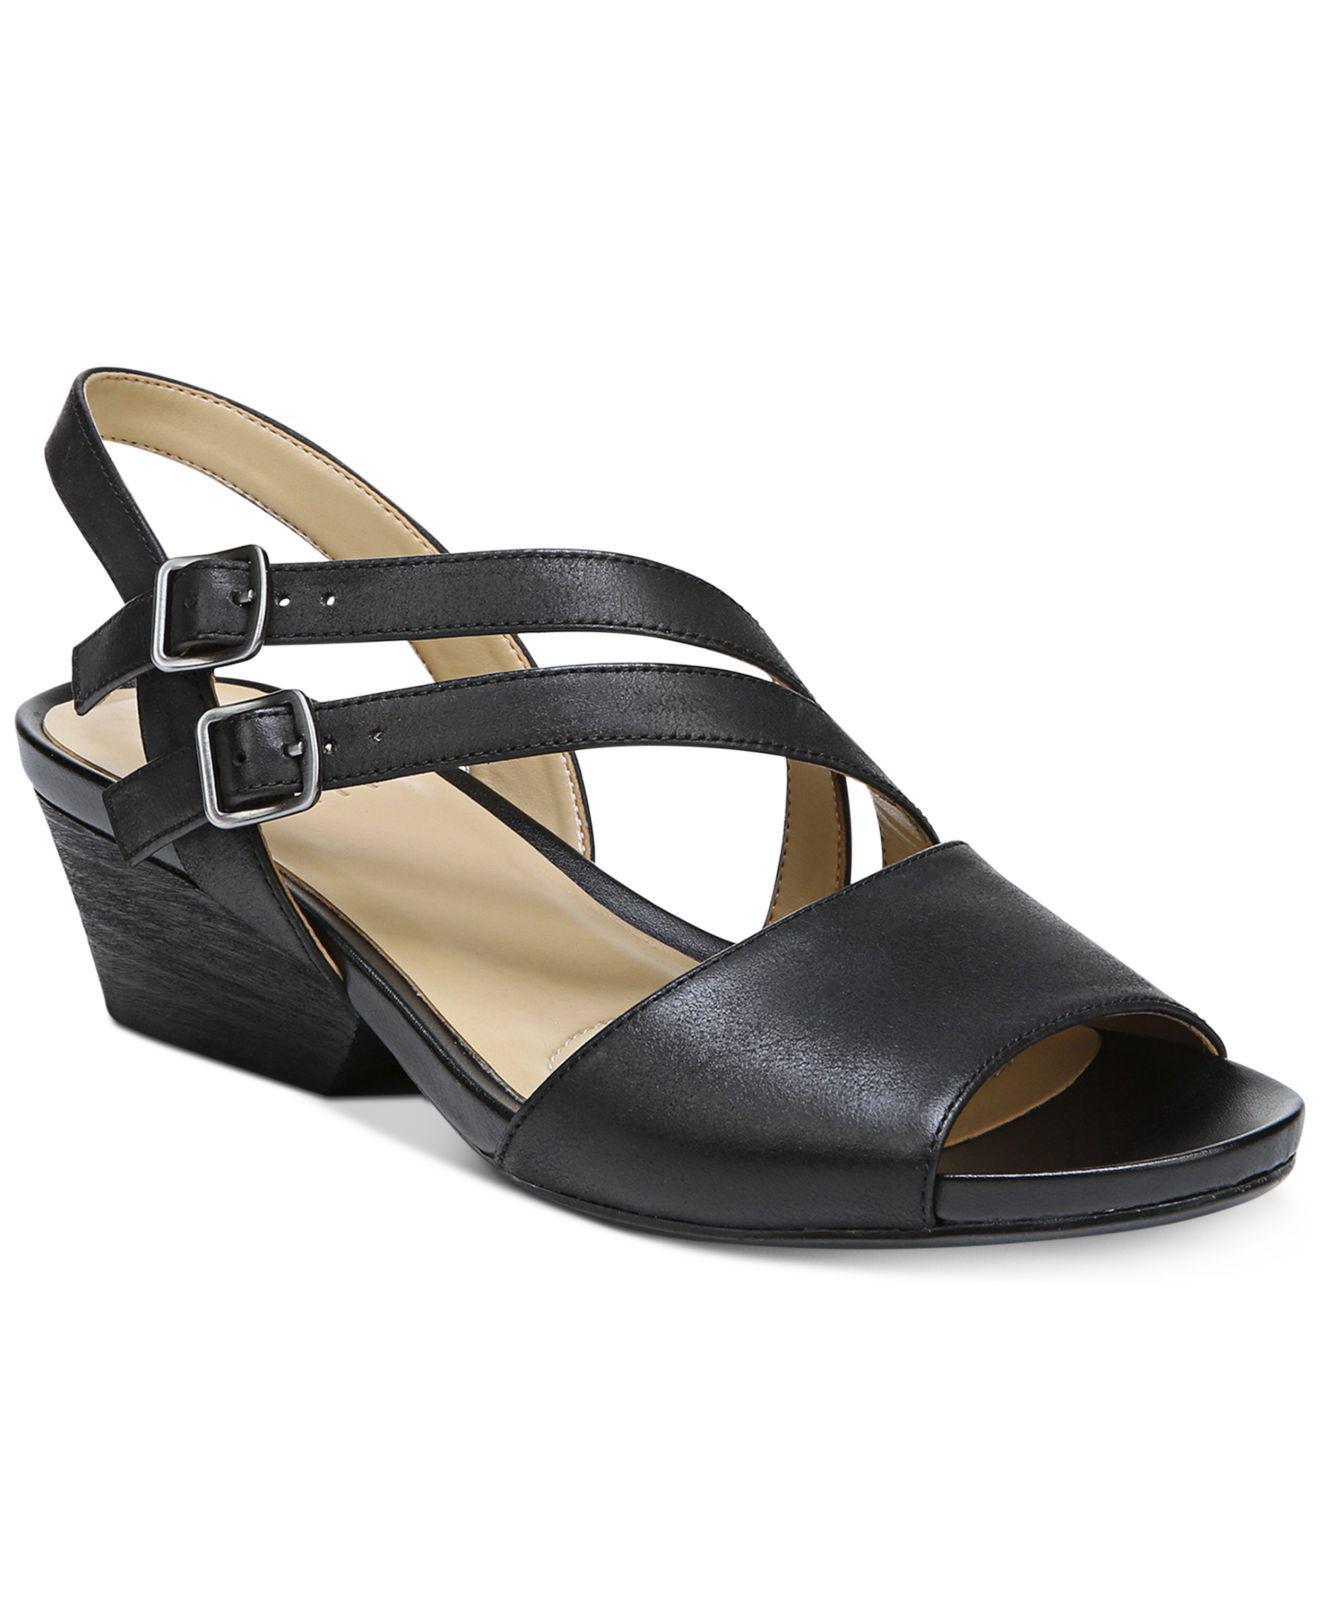 Naturalizer Davi Studded Flat Sandal(Women's) -Yellow Microfiber Popular 6v2PO